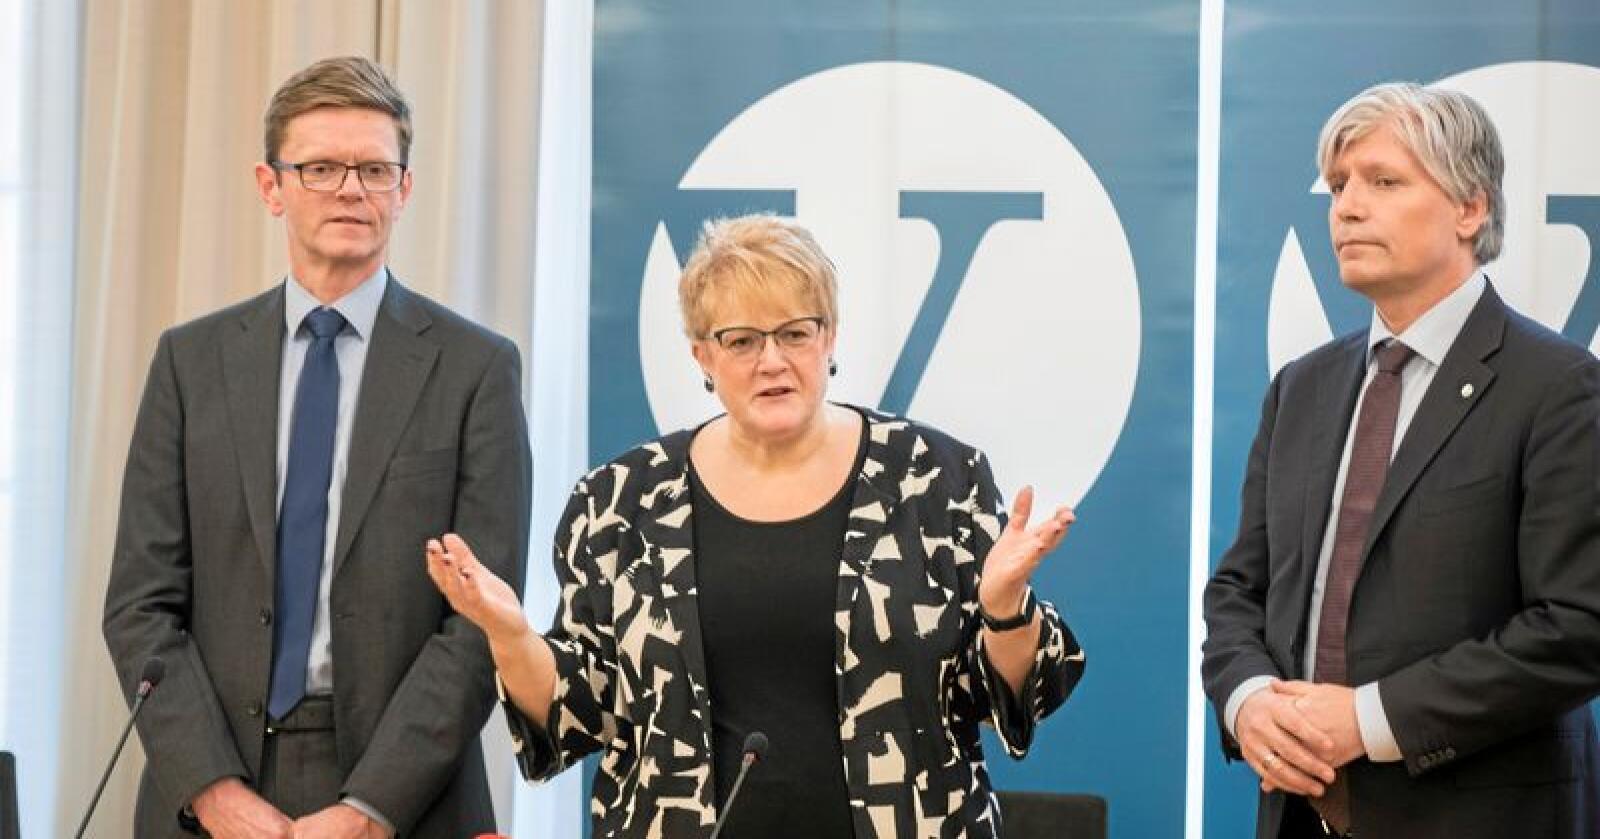 Venstres pressekonferanse før landsmøte med ledertrio Trine Skei Grande, Ola Elvestuen og Terje Breivik (t.v). Foto: Vidar Ruud / NTB scanpix